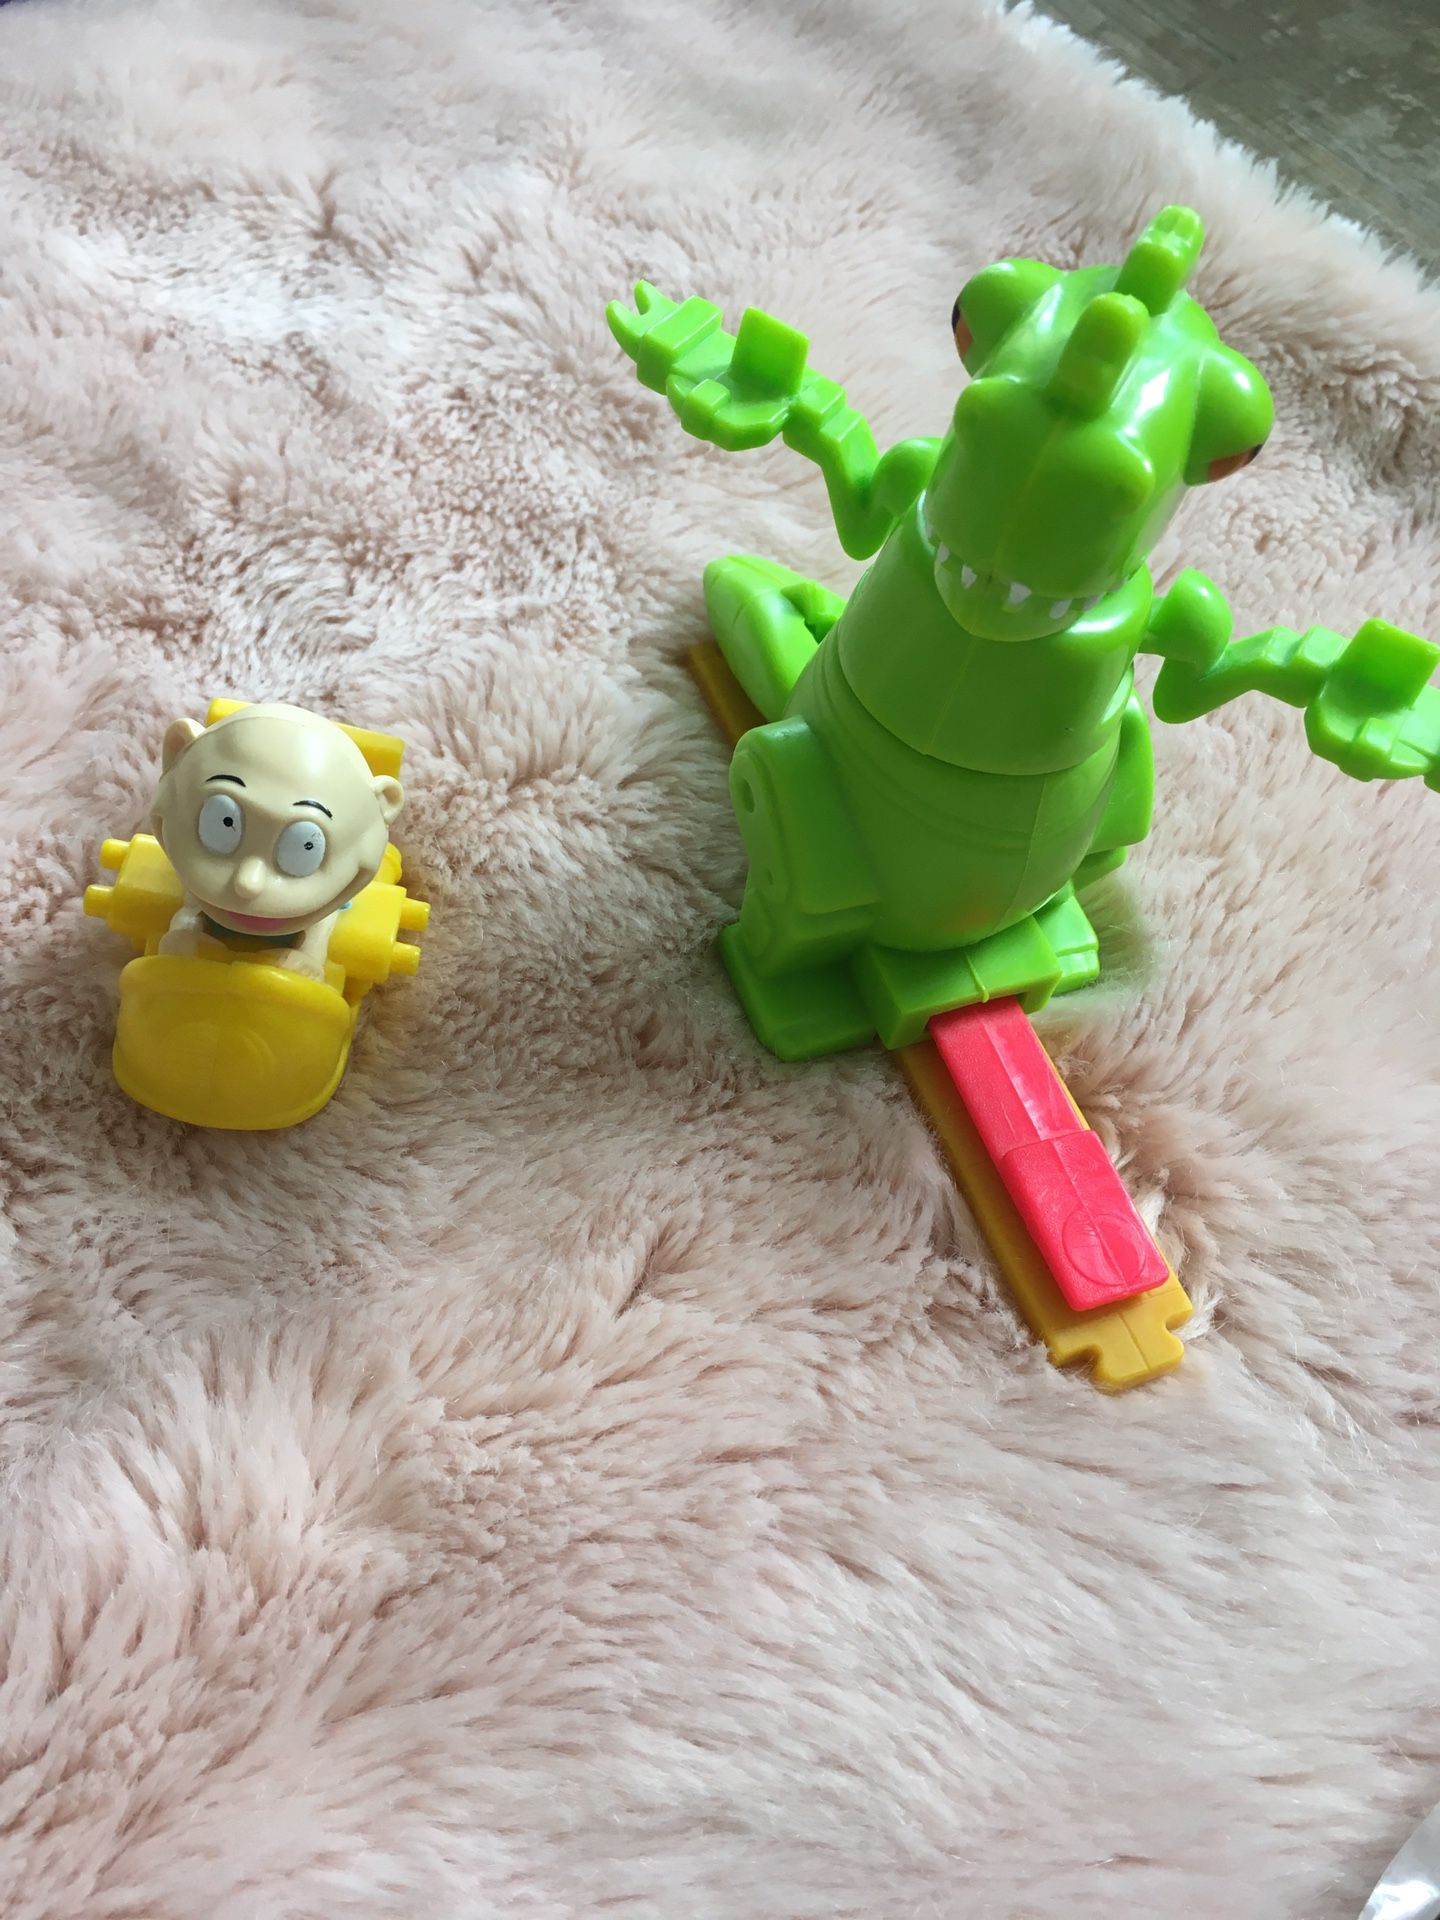 '00 Burger King Nickelodeon Rugrats toys